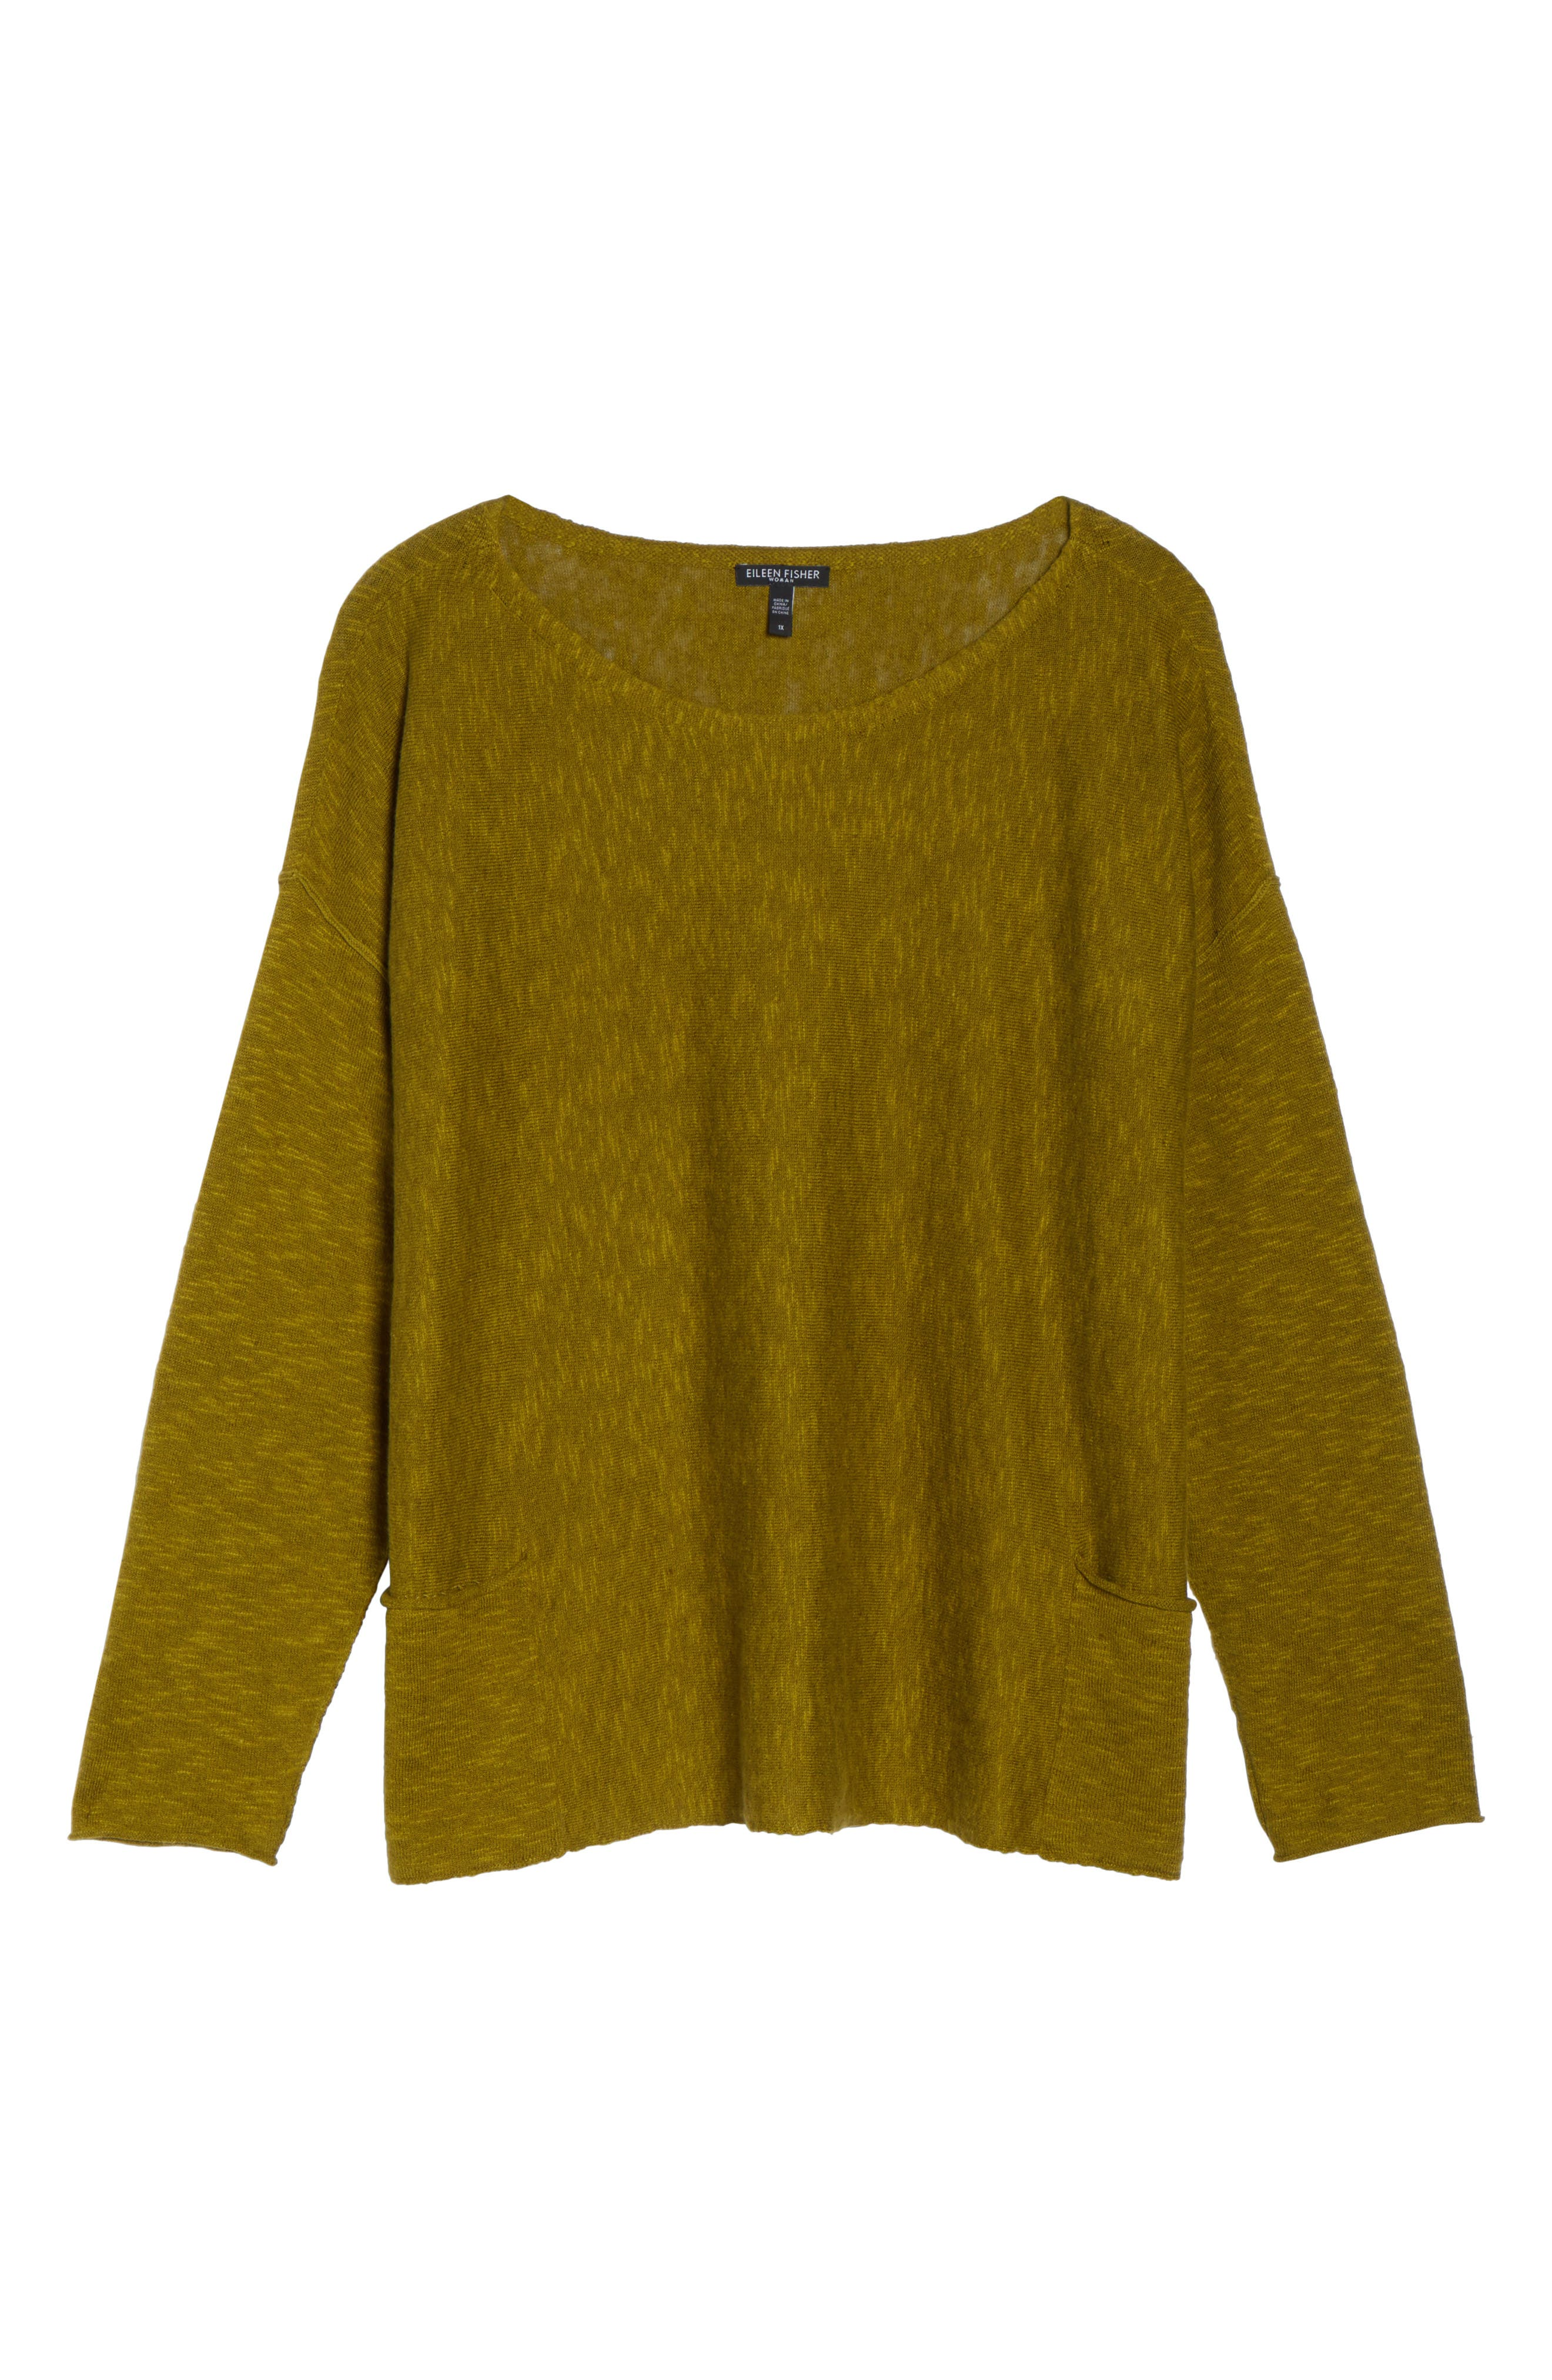 Organic Linen & Cotton Sweater,                             Alternate thumbnail 6, color,                             201